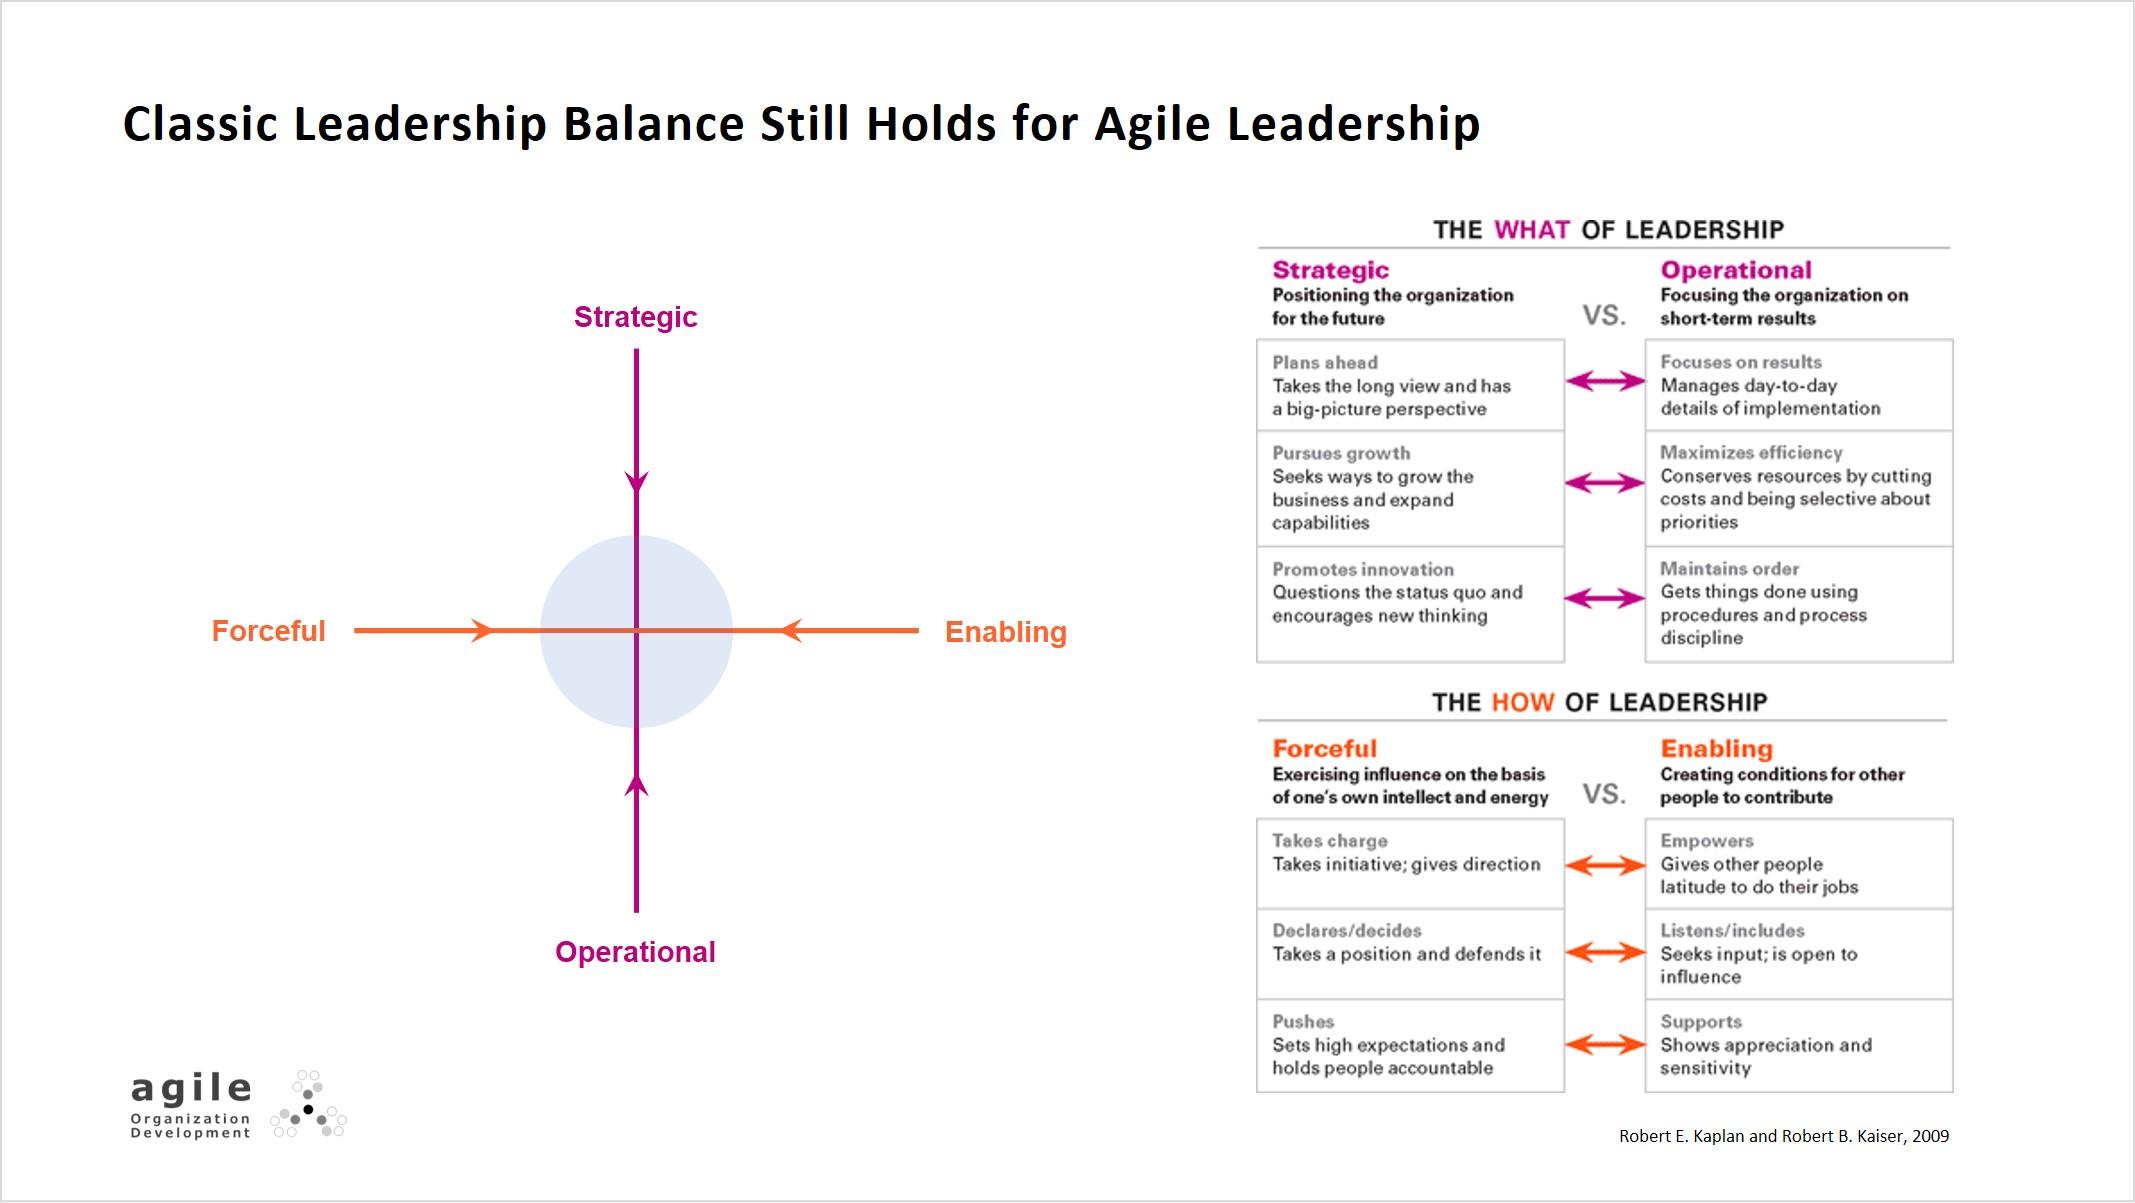 Classic leadership balance still holds for agile leadership